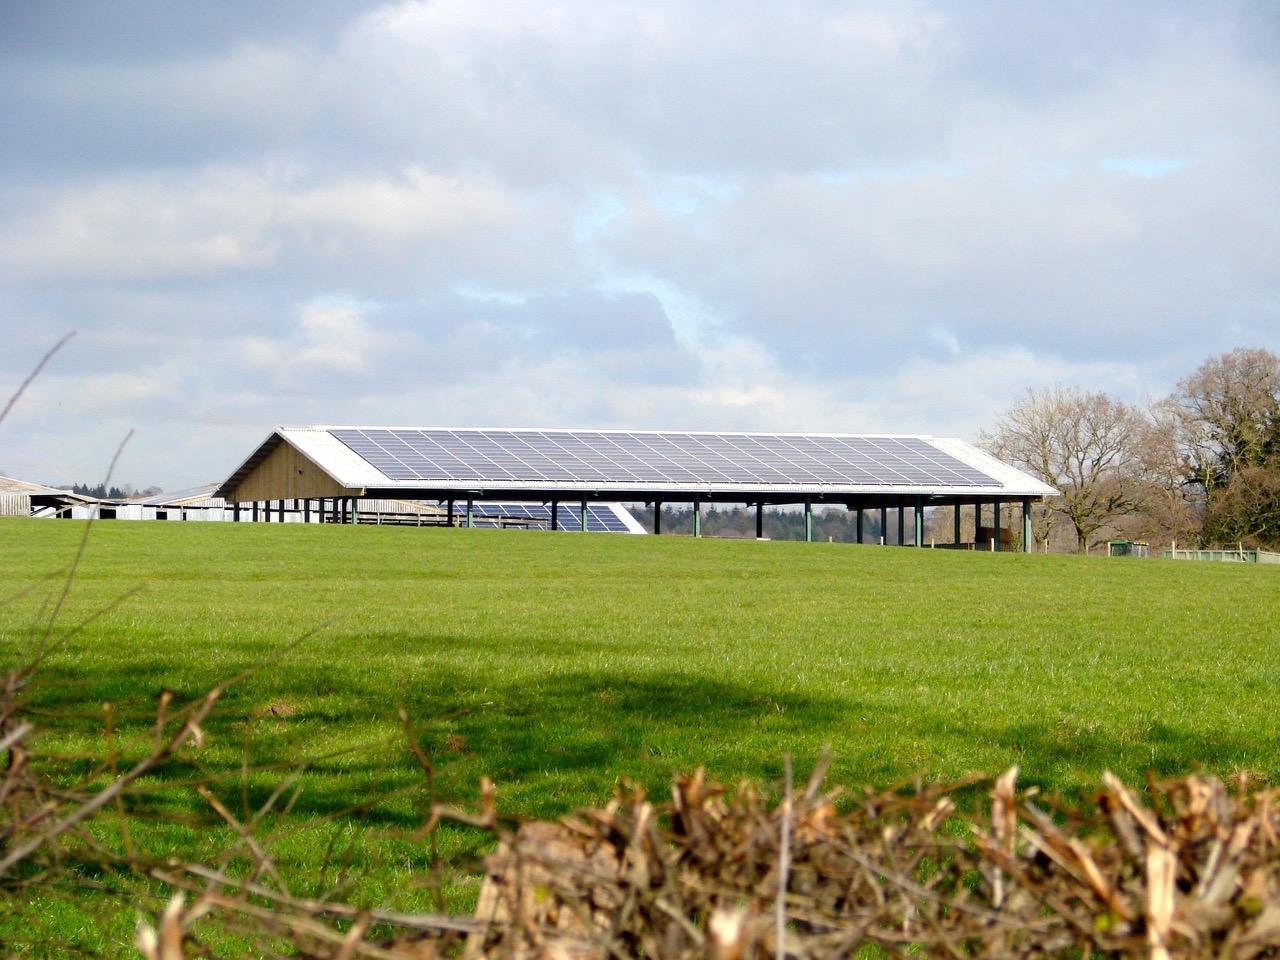 Morehouse Farm